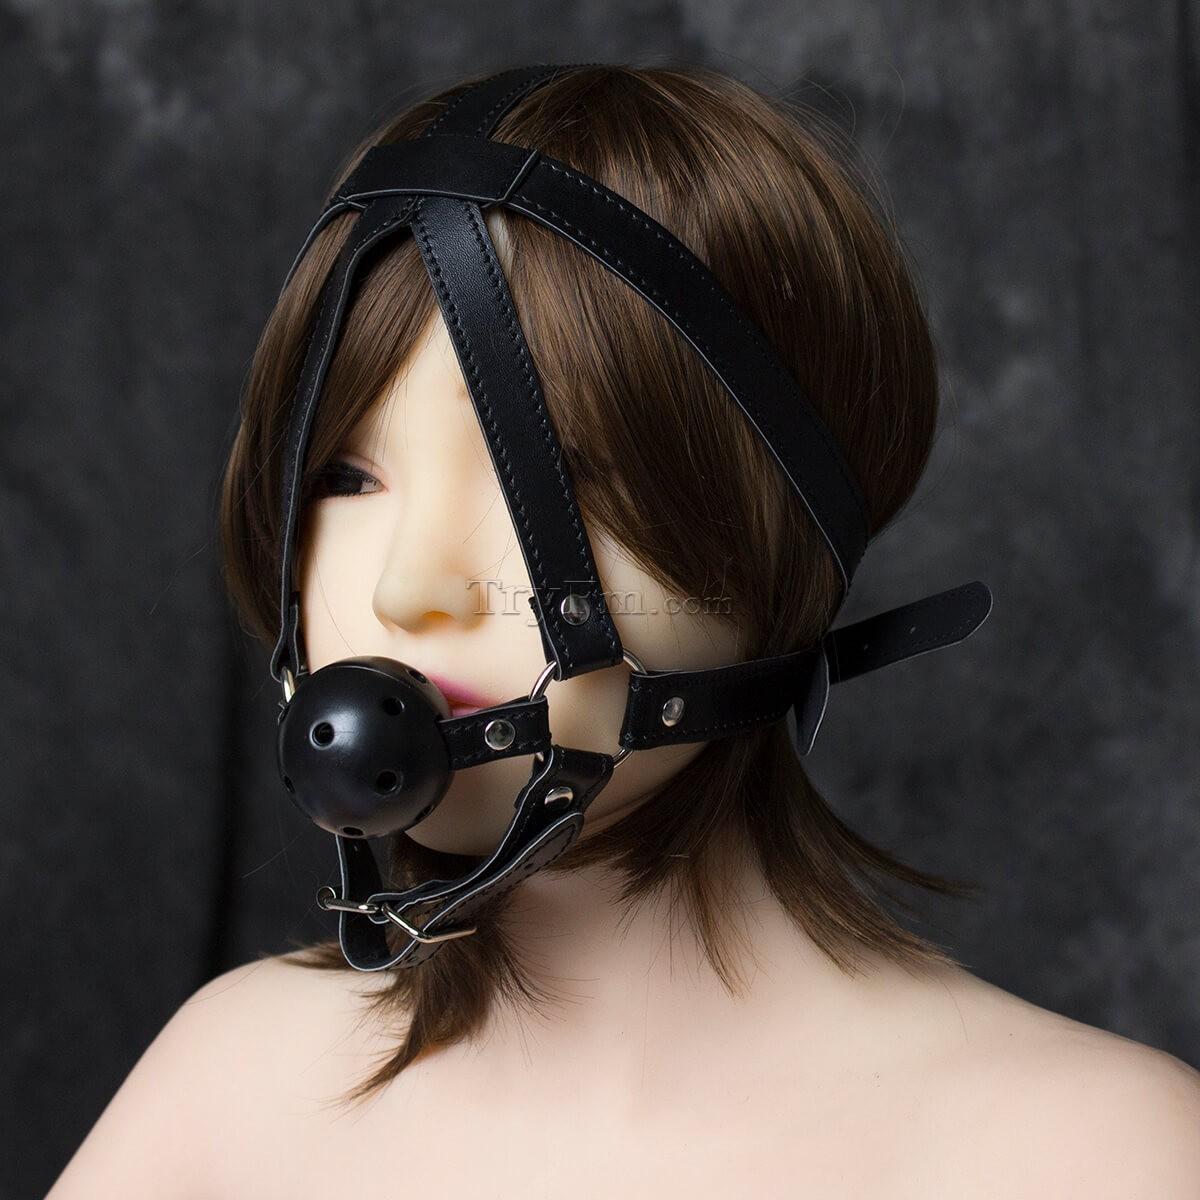 23-Breathable-Ball-Gag-Harness-11.jpg